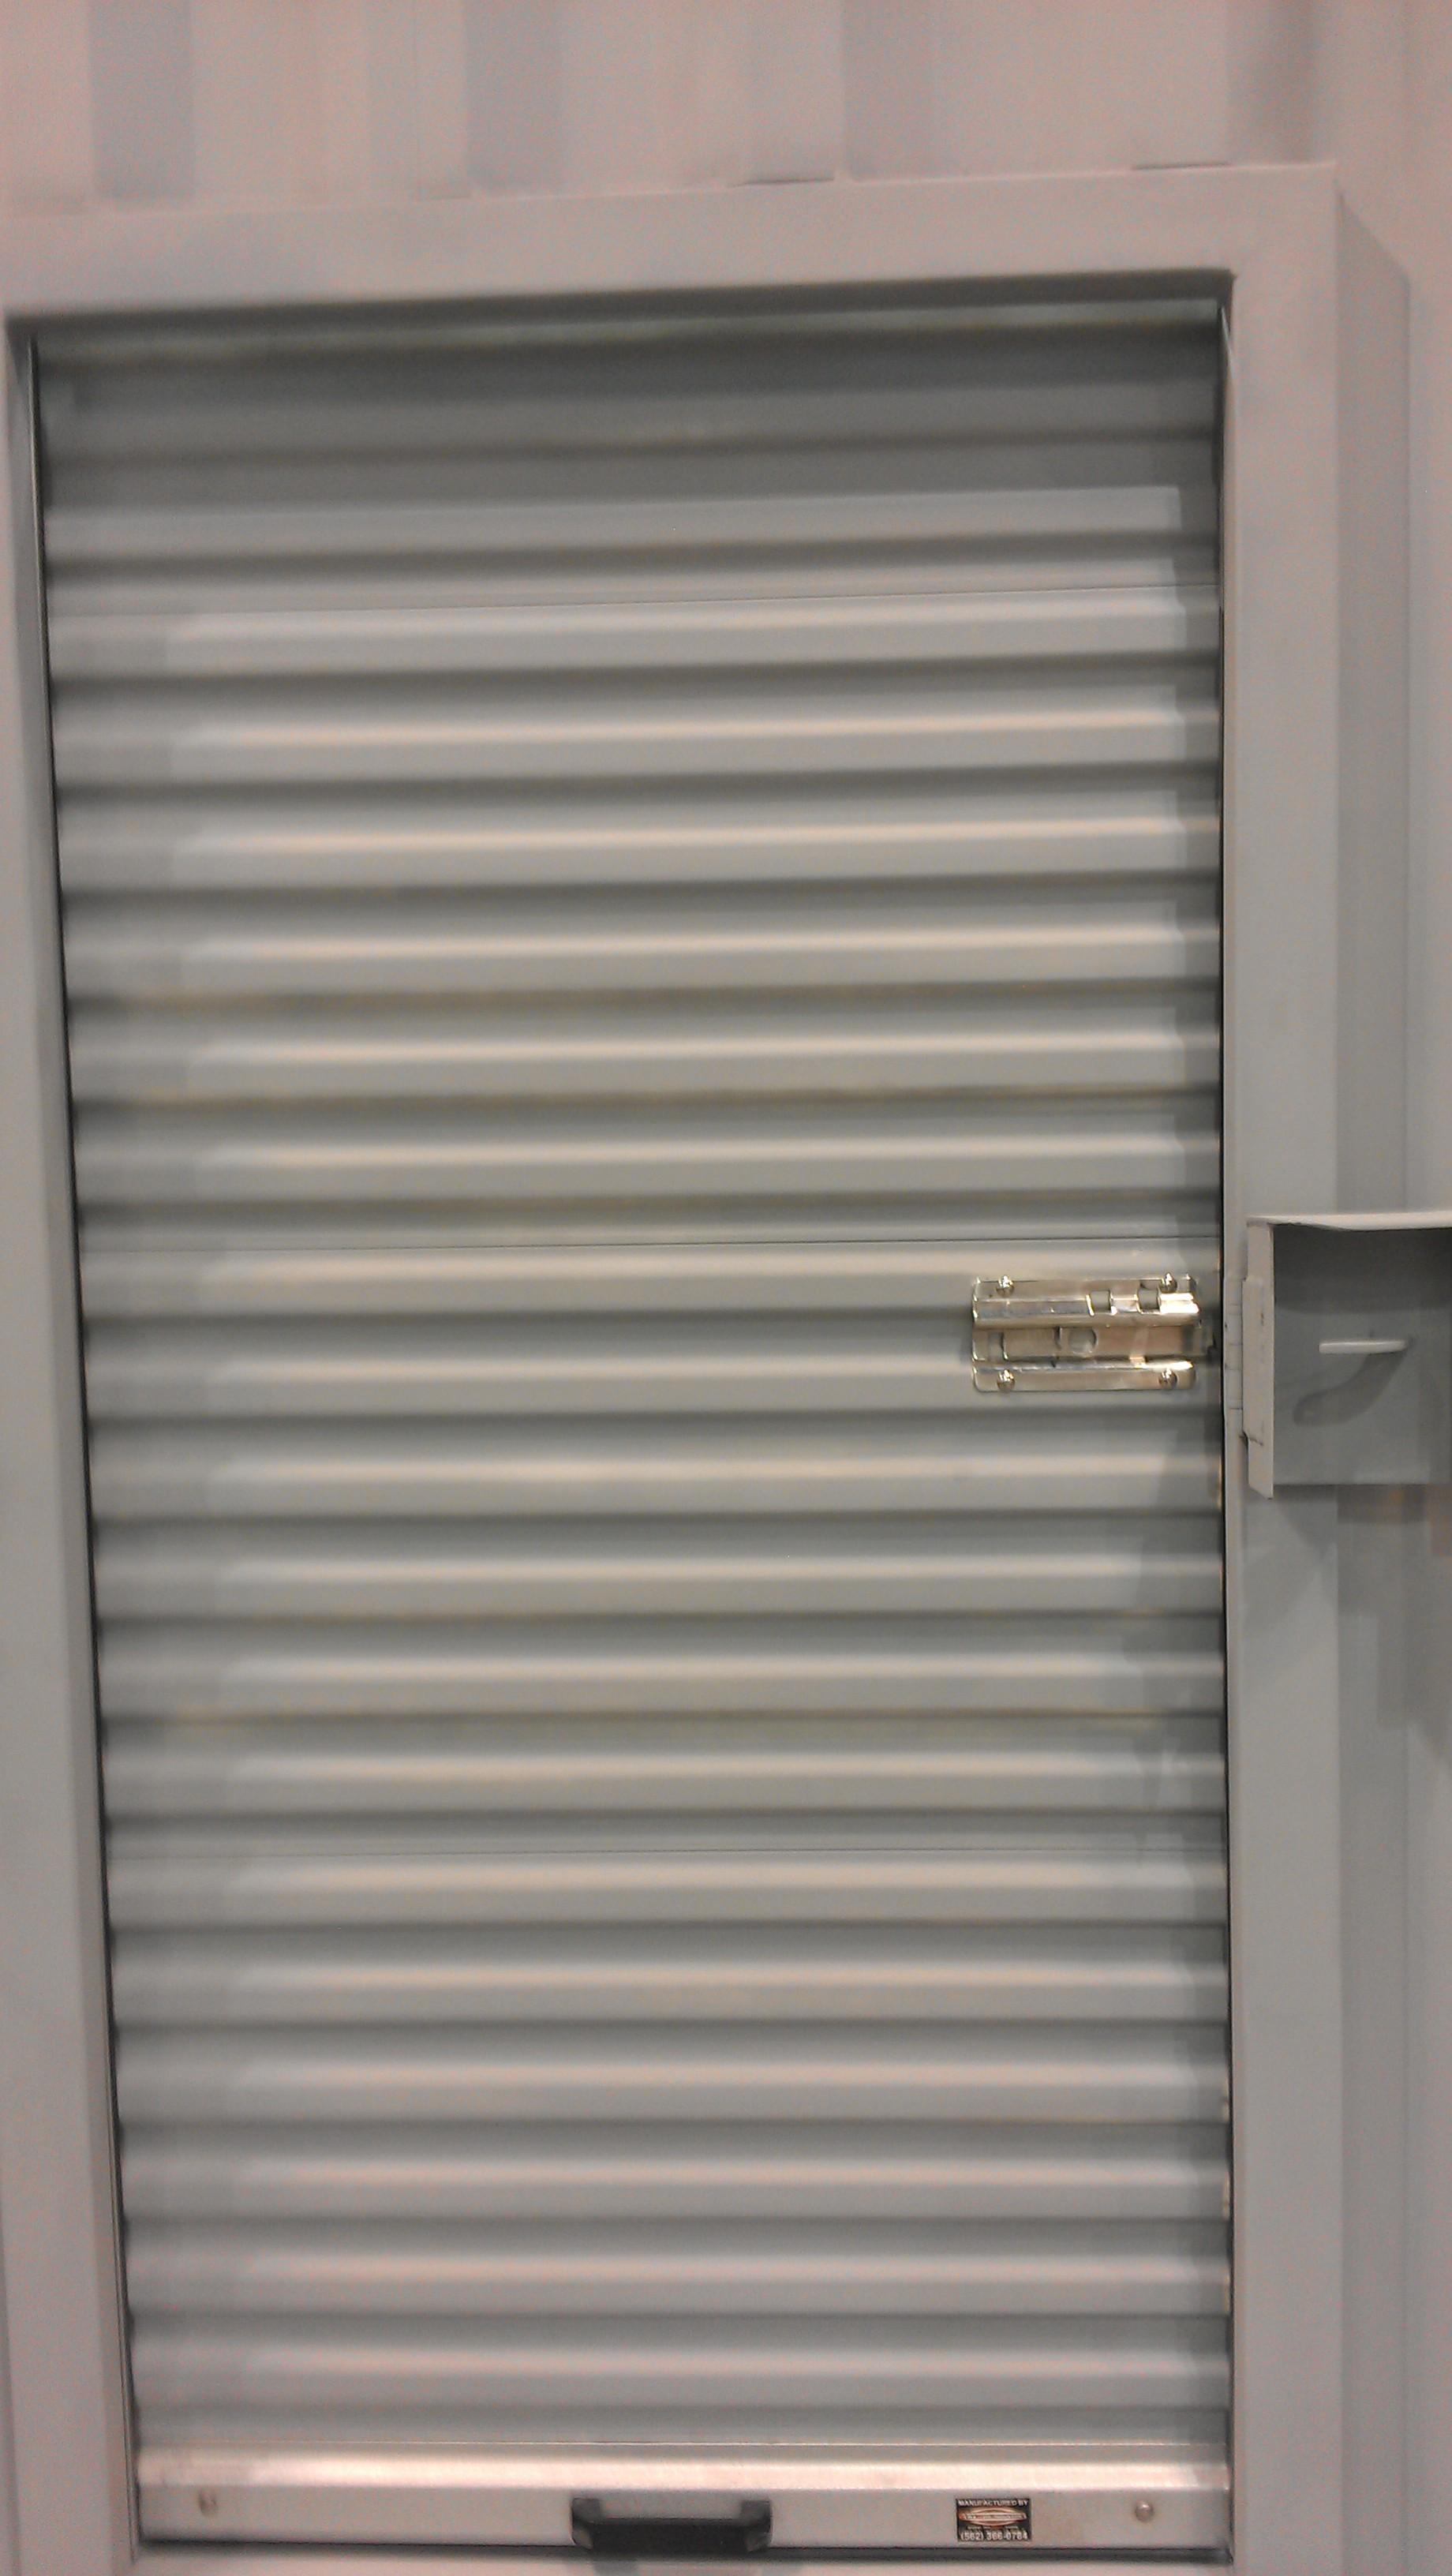 Narrow roll-up door installed with optional lockbox